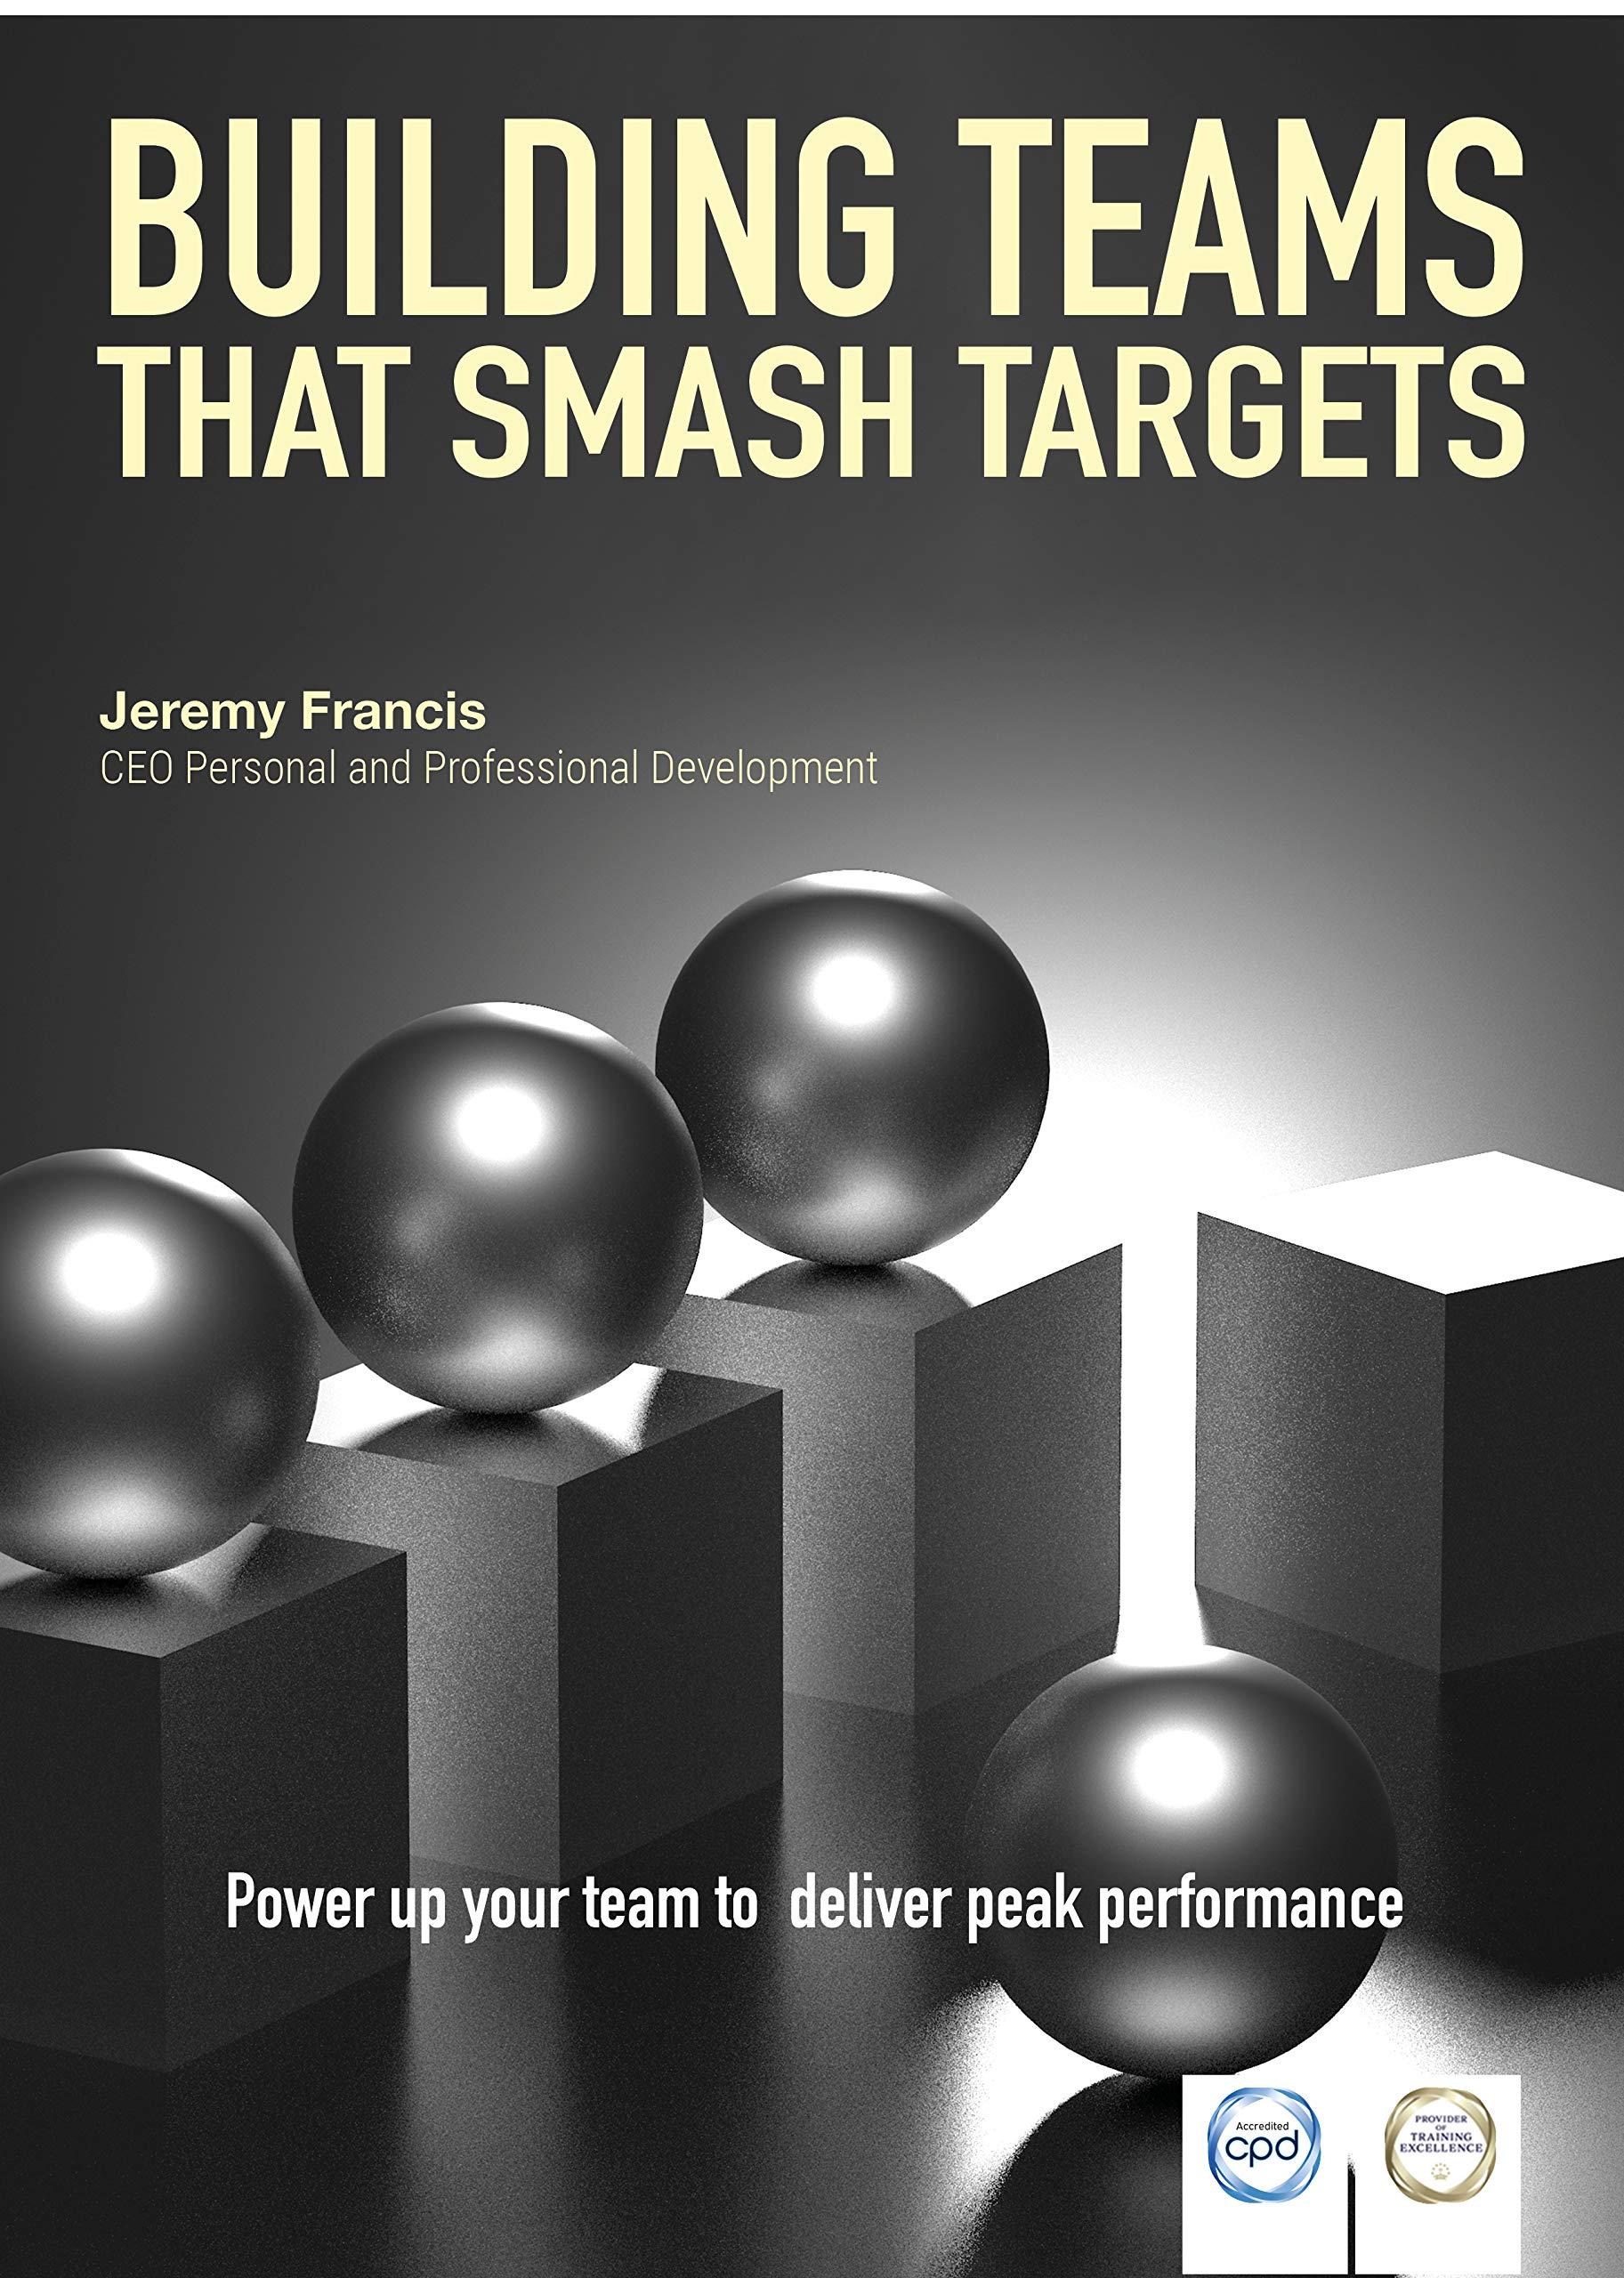 Building Teams that Smash Targets